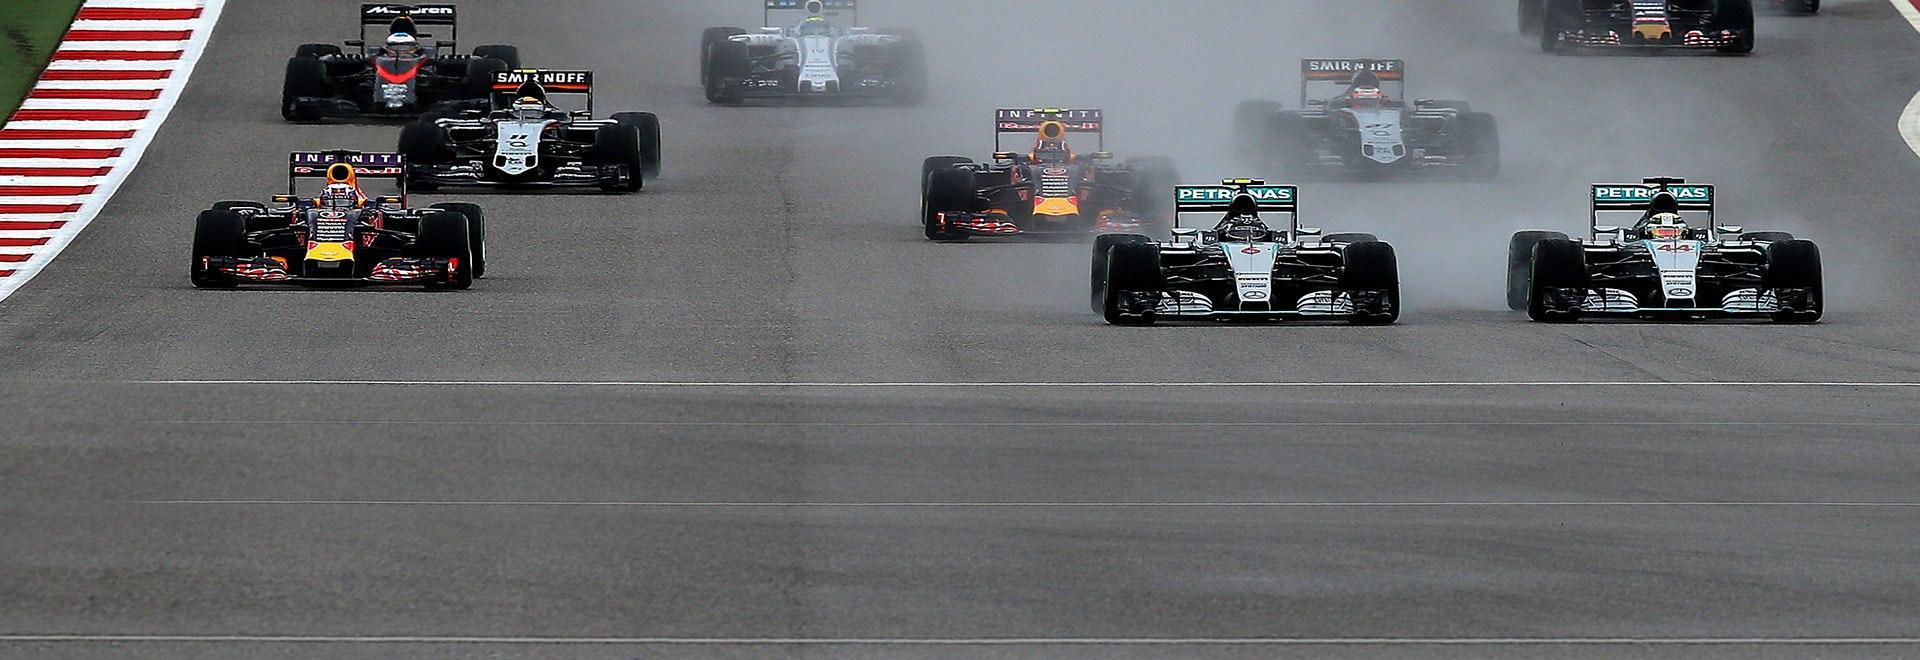 F1 Fever 2015